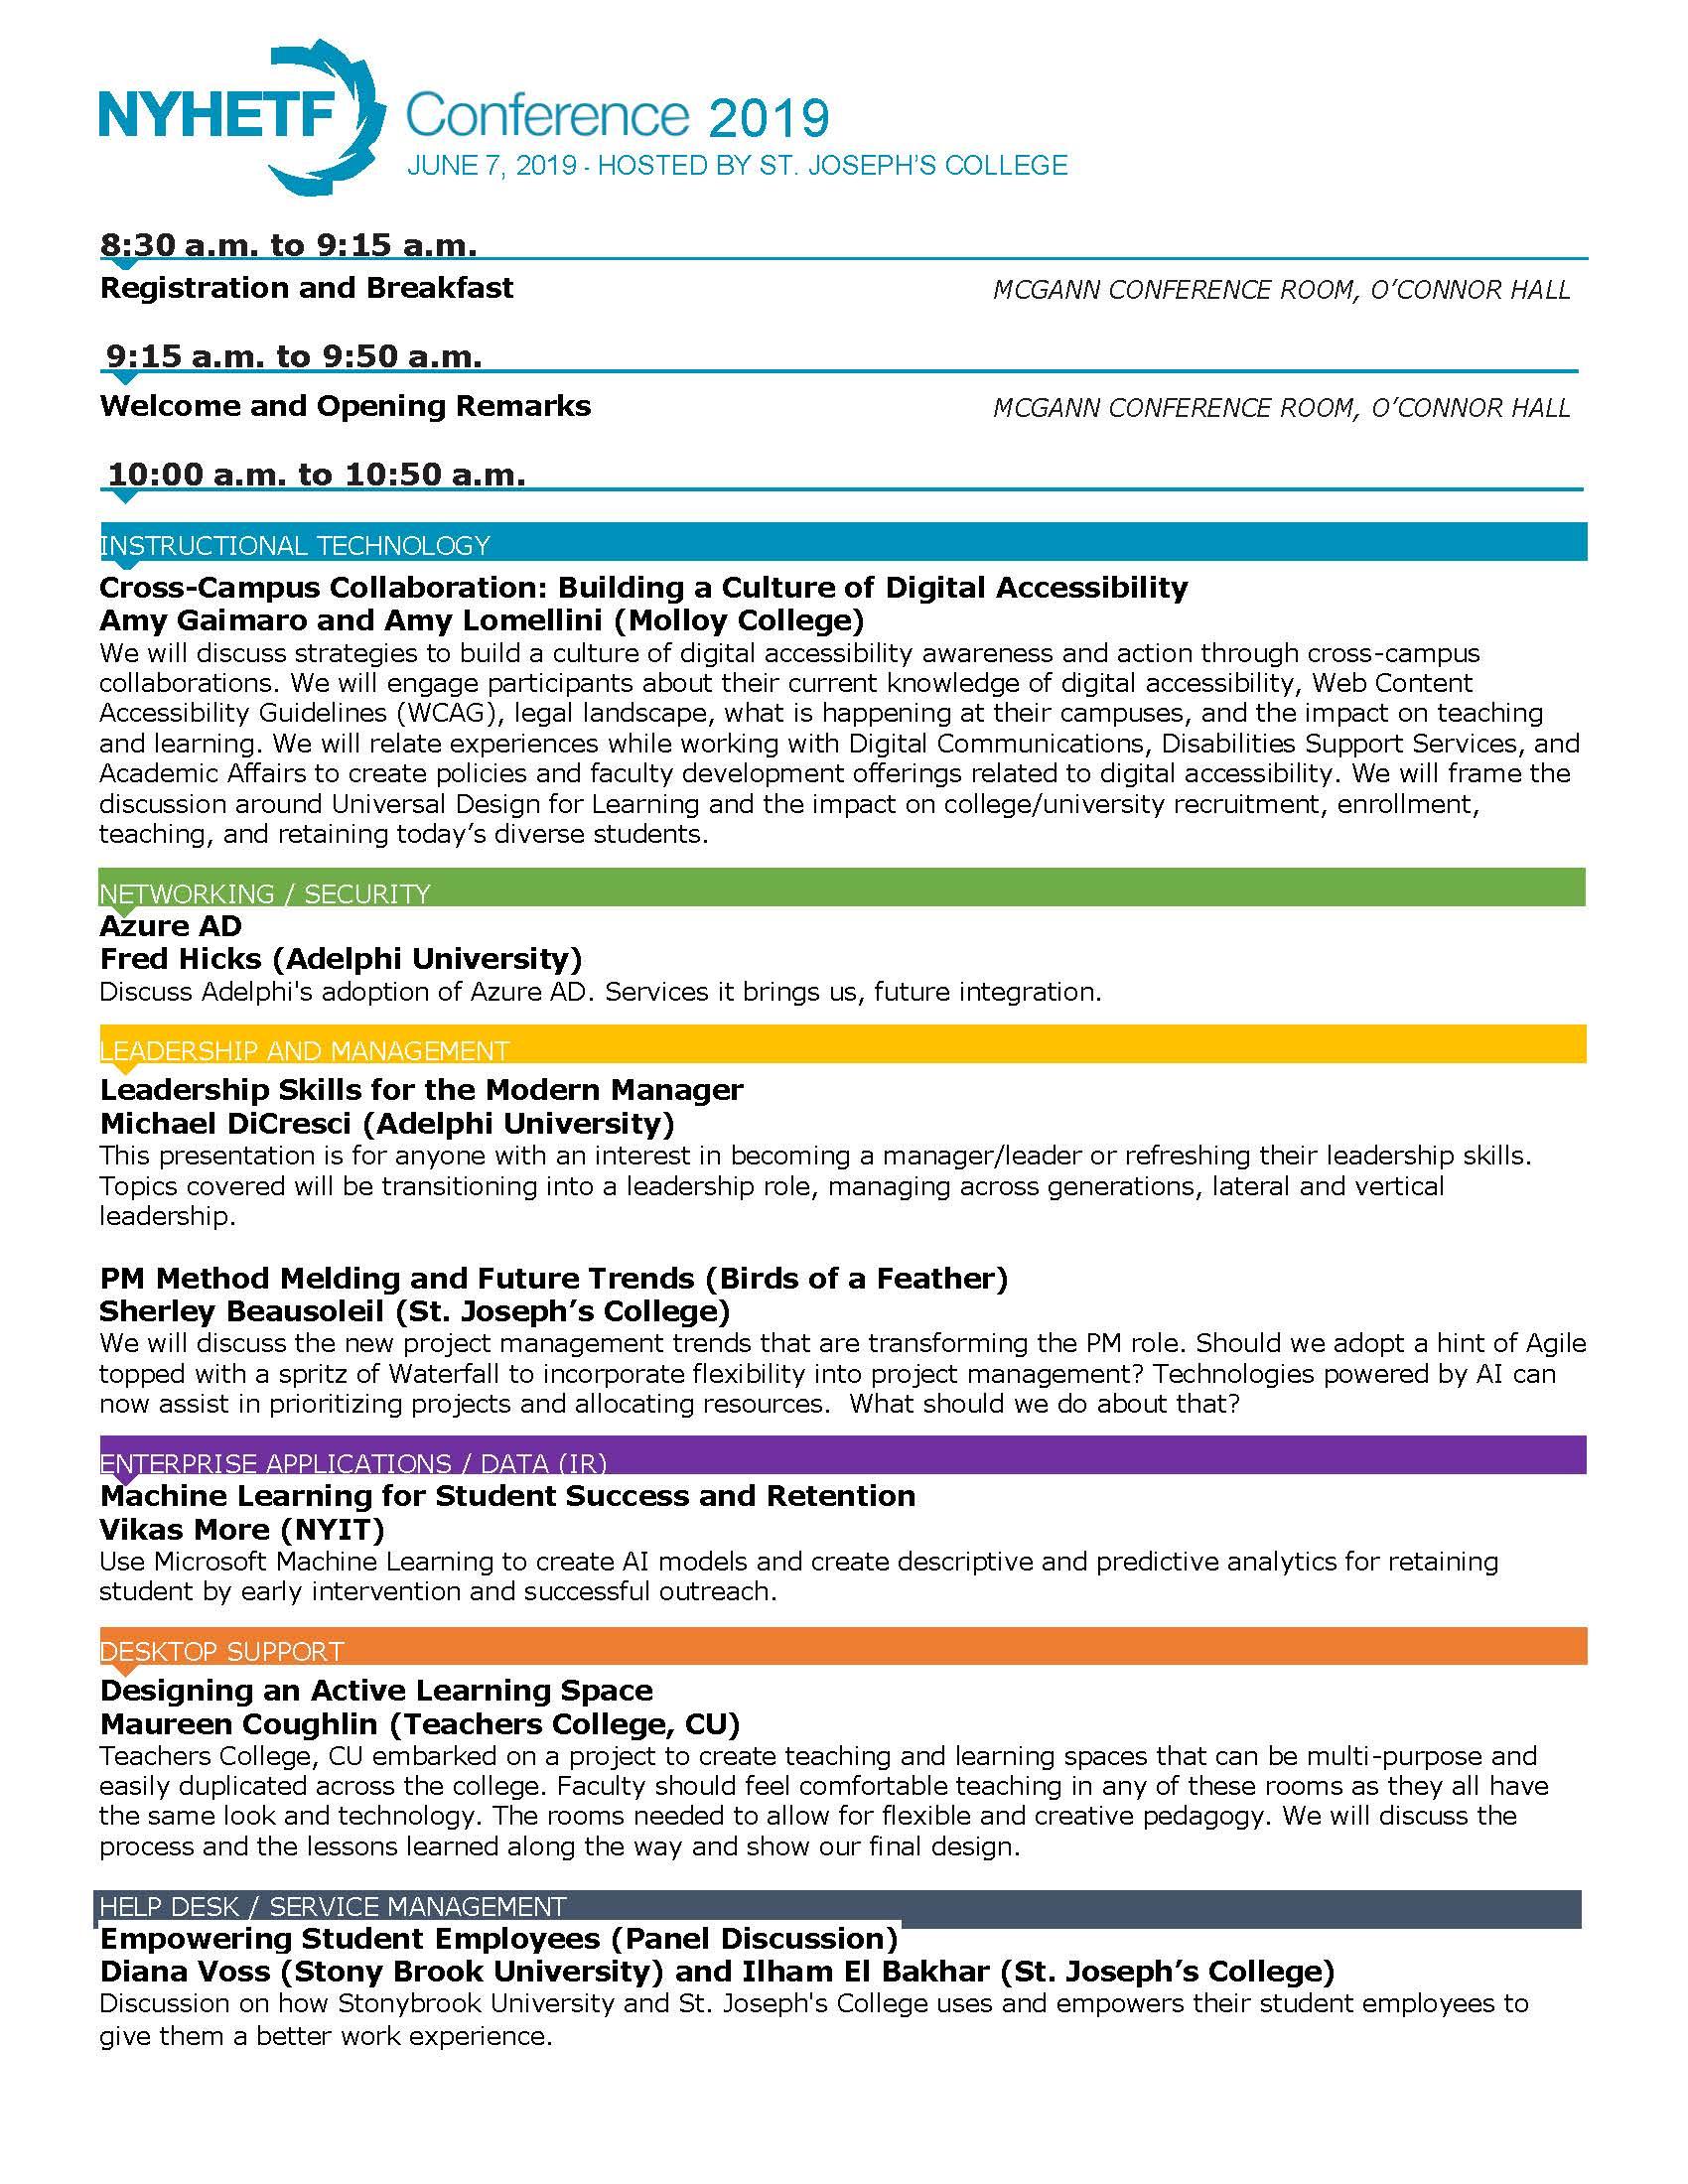 NYHETF 2019 SJC Agenda as of 5-21-19 Page 1.jpg